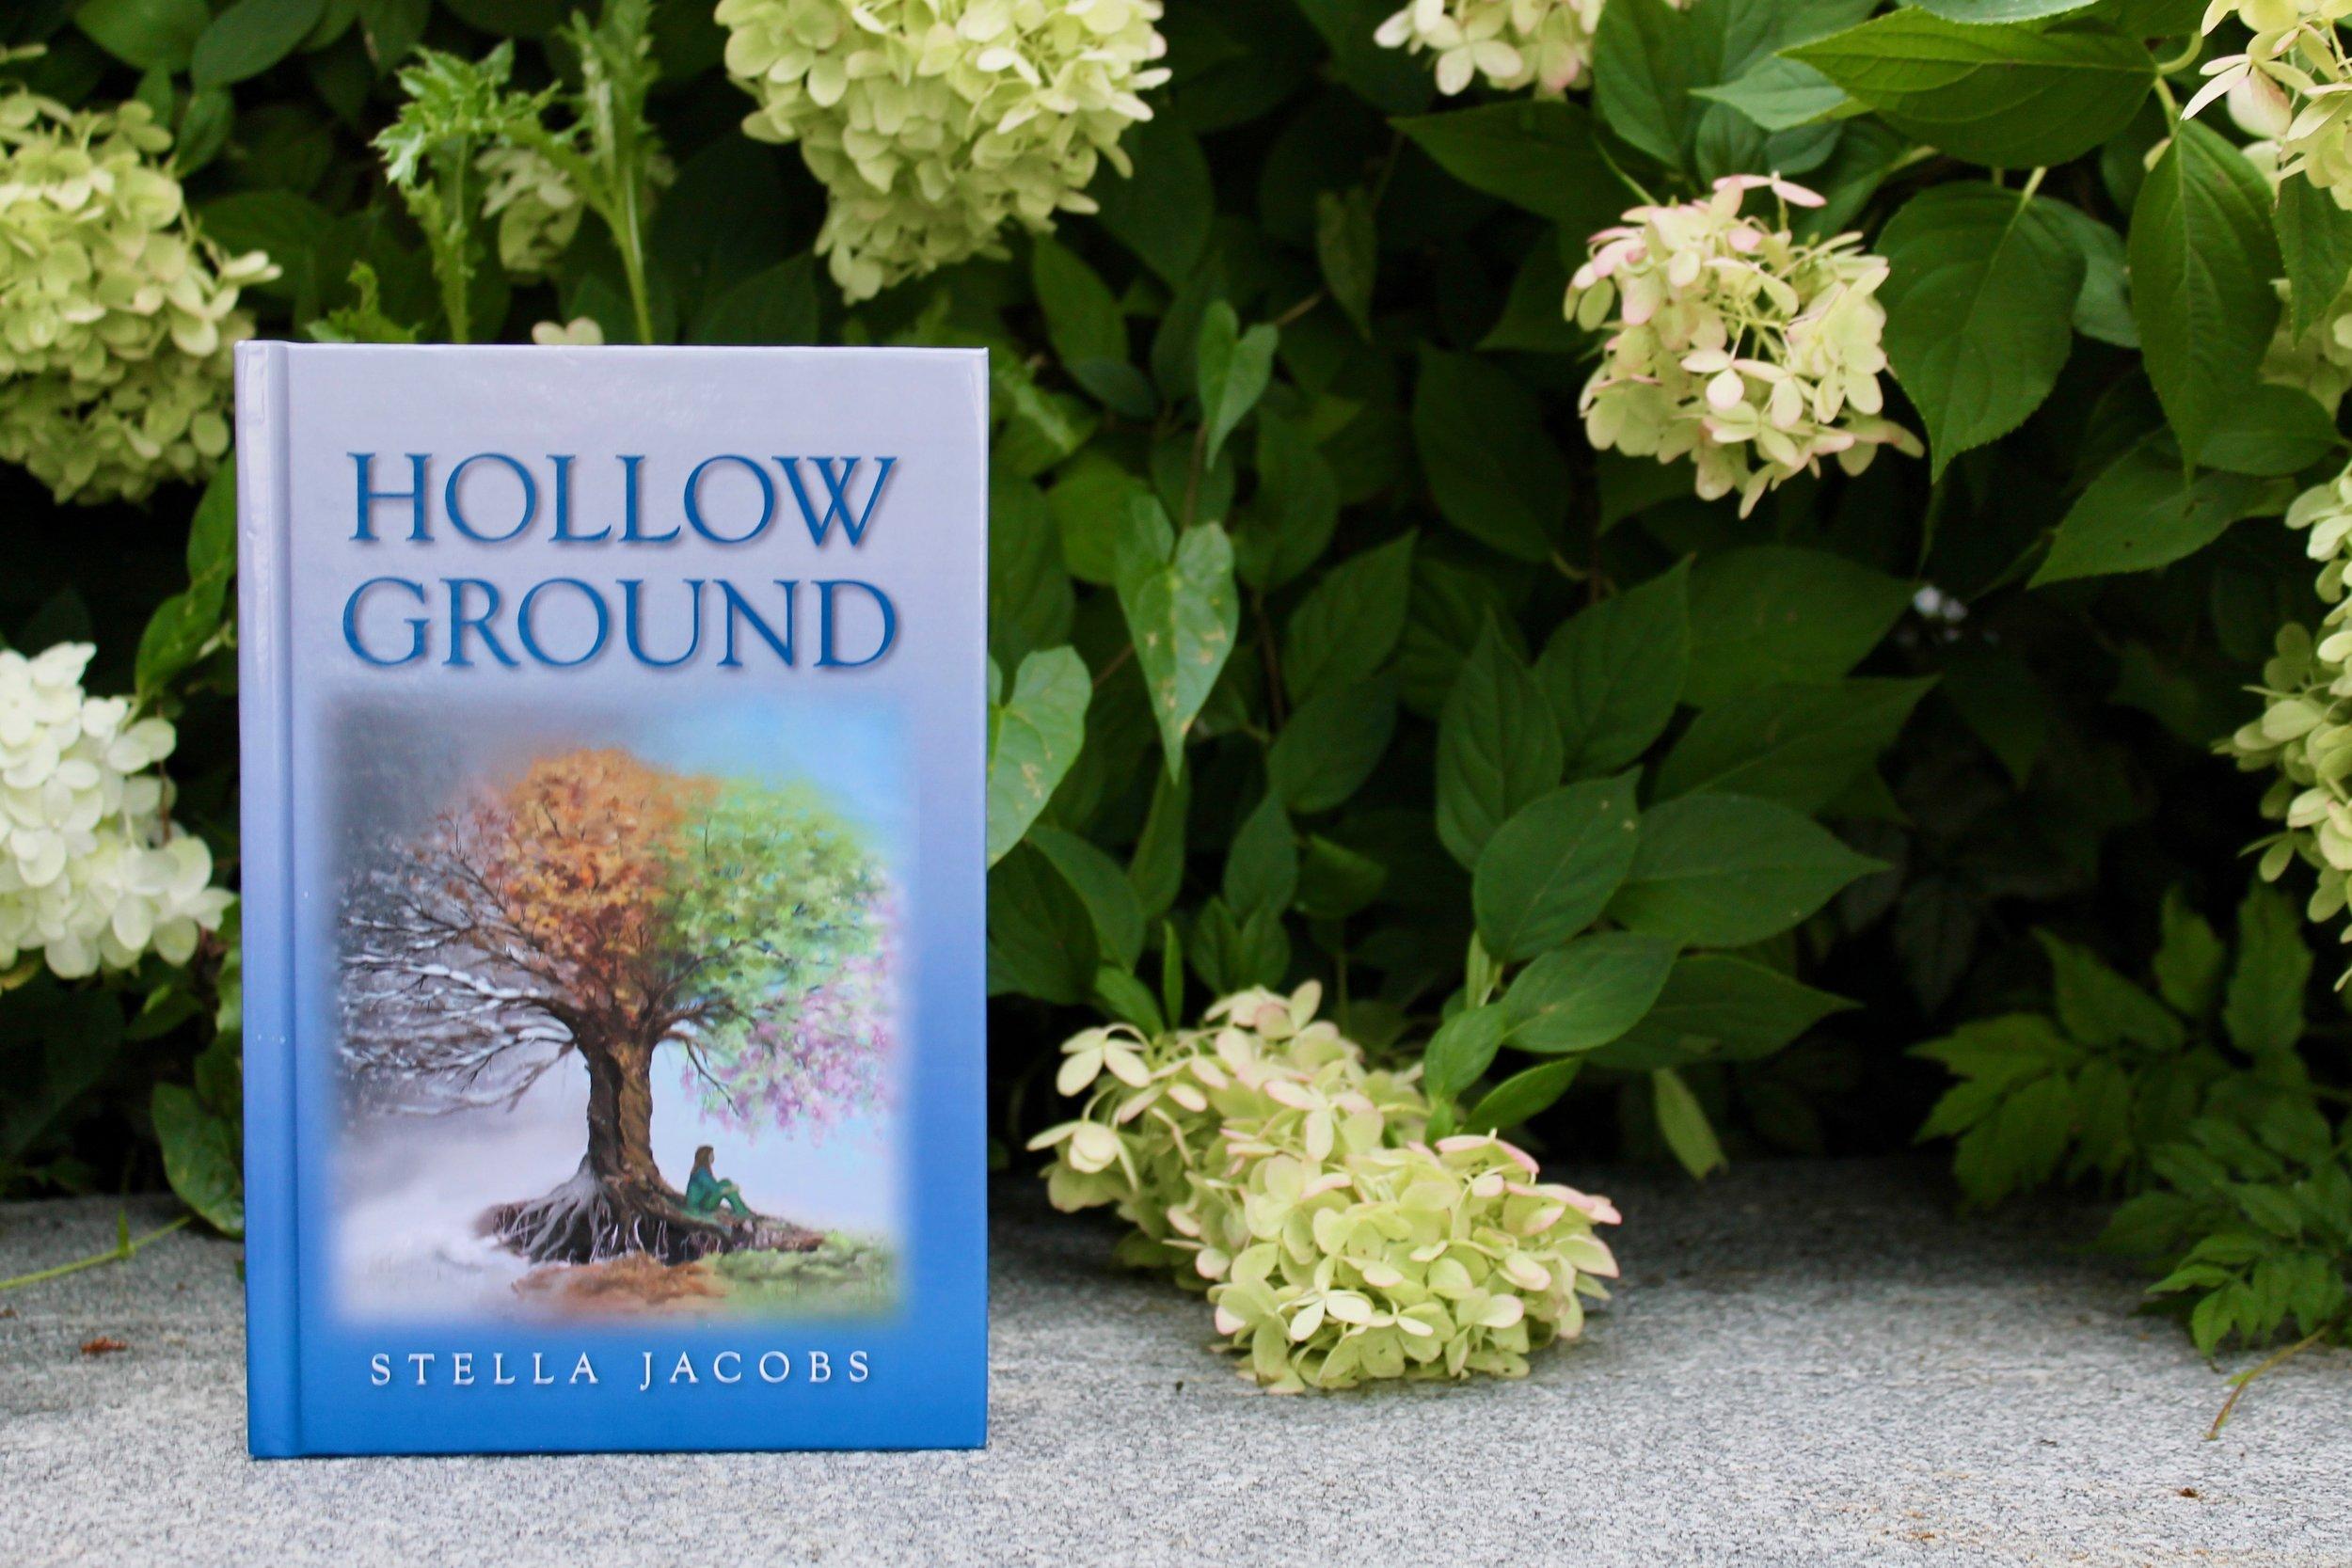 Book — Stella Jacobs, Author